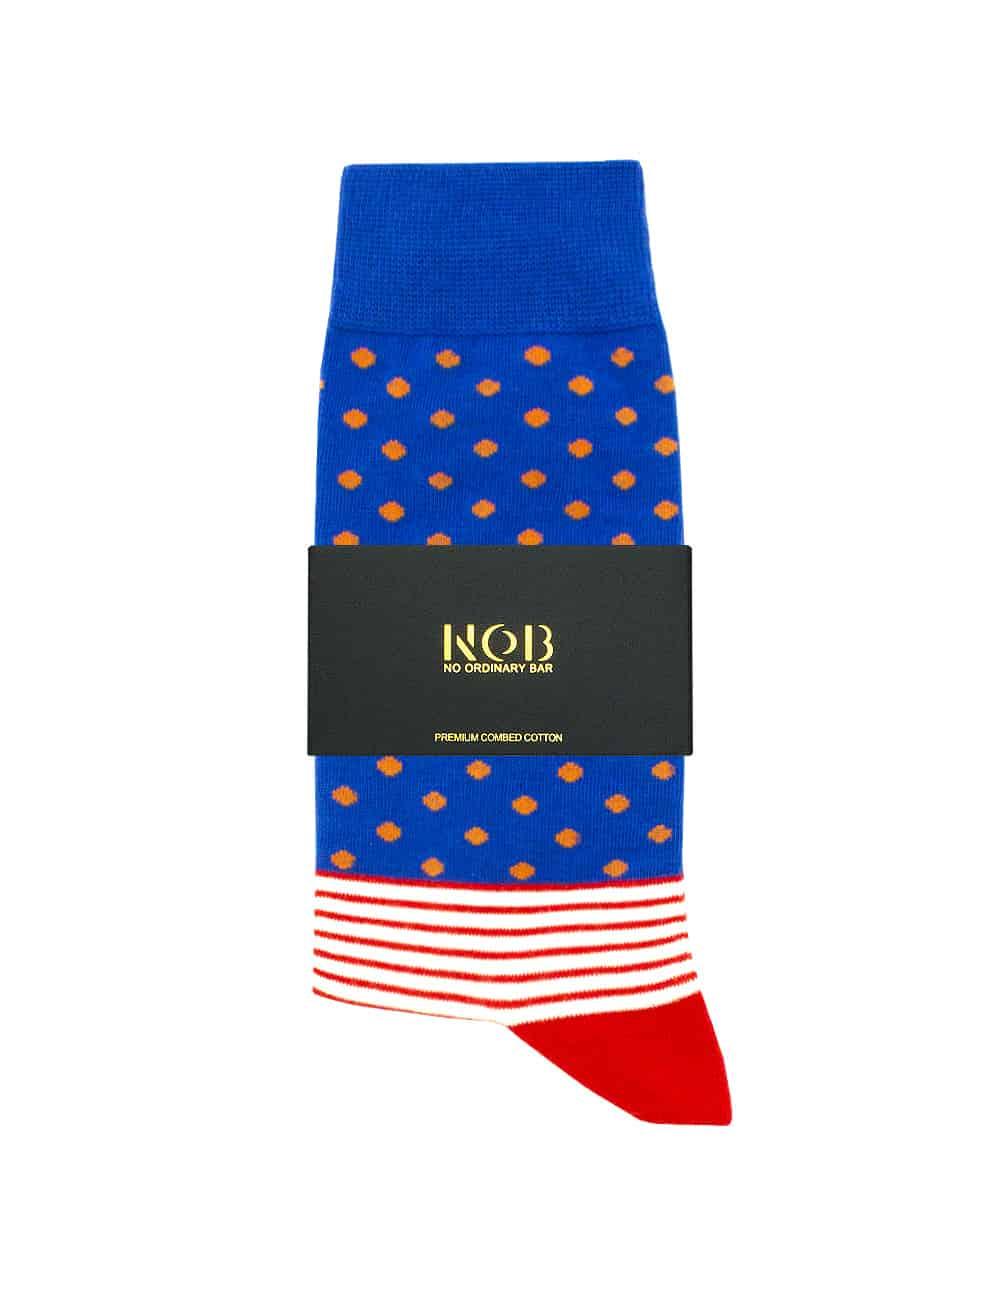 Blue with Orange Polka Dots Crew Socks made with Premium Combed Cotton SOC2B.NOB1